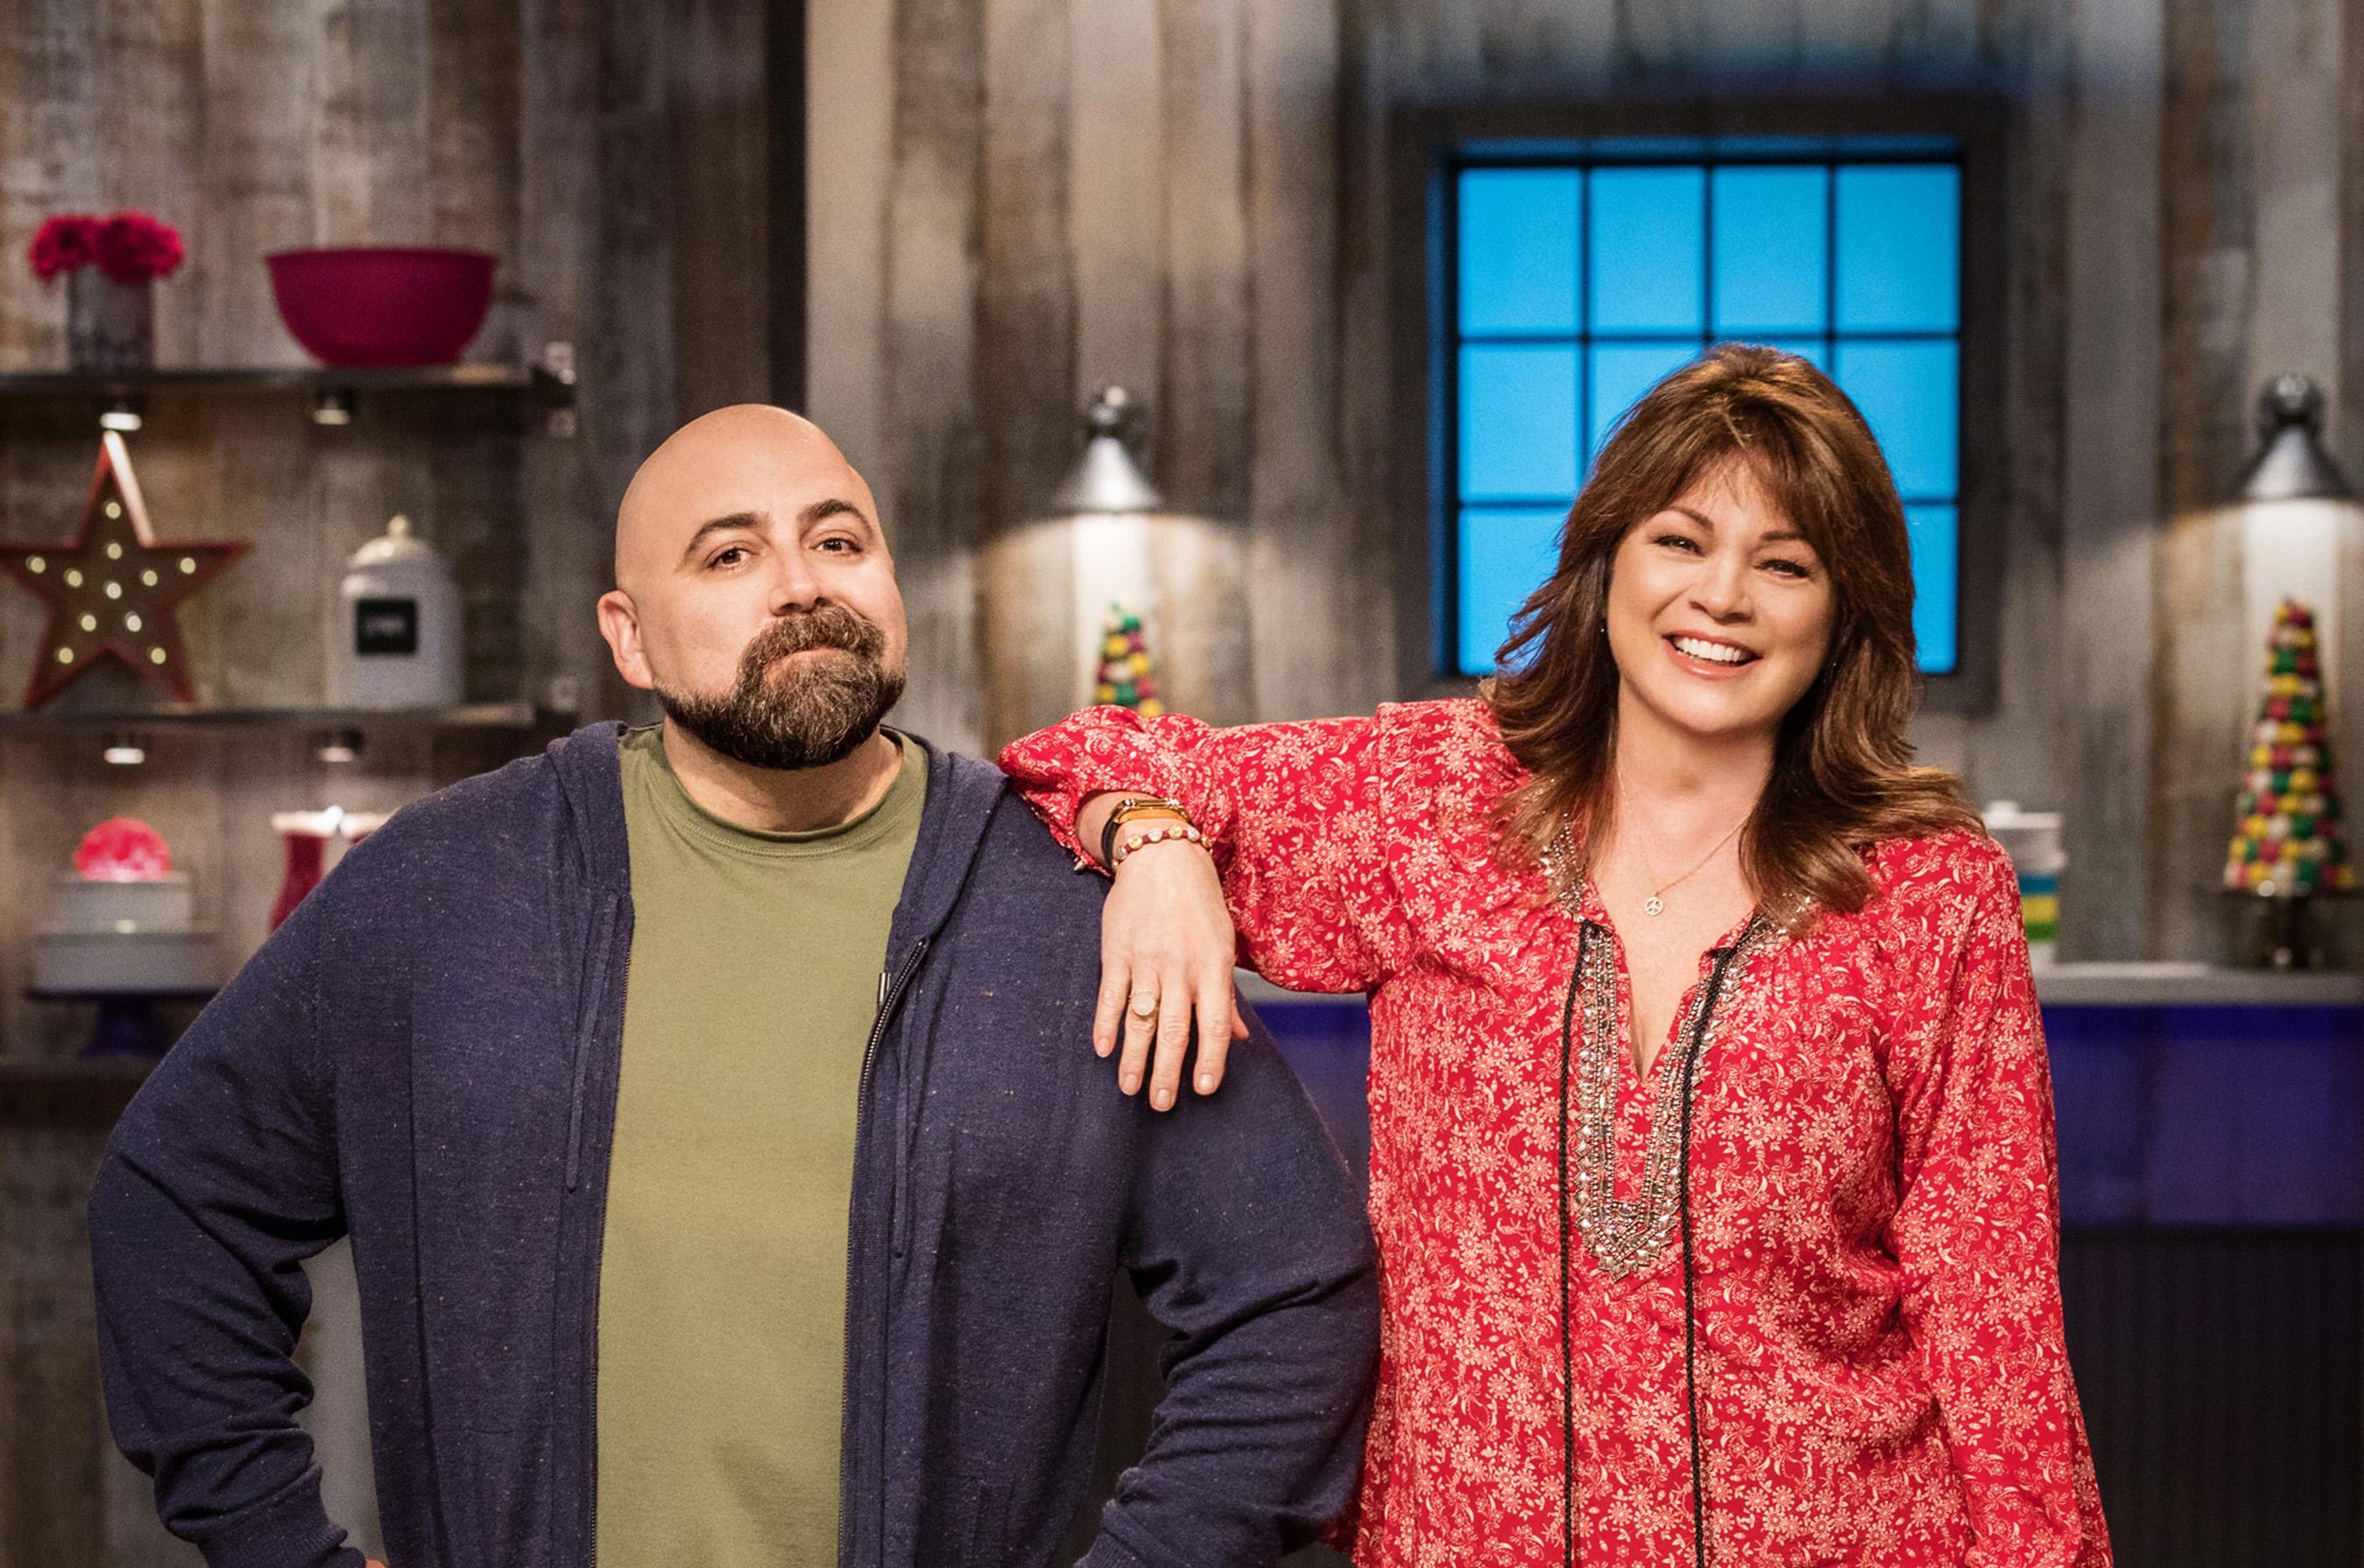 Duff Goldman and Valerie Bertinelli on Food Network's Kids Baking Championship